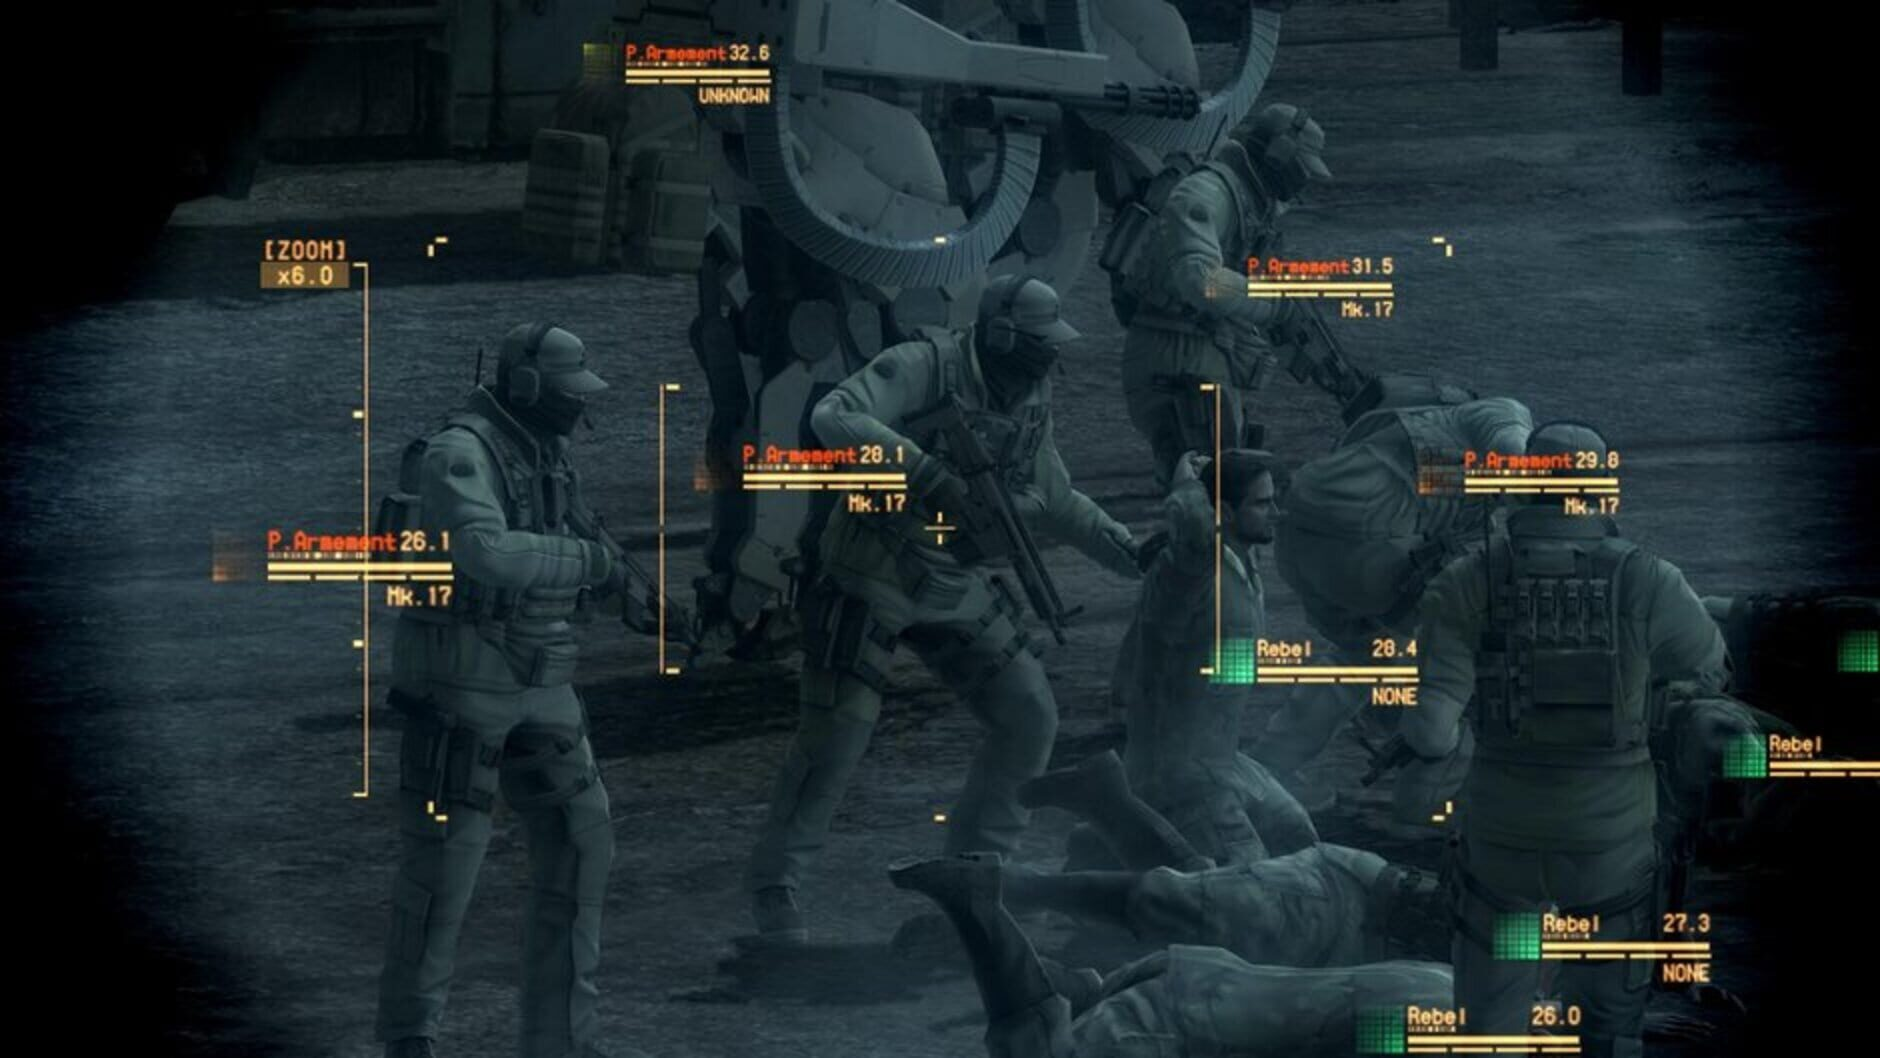 Metal Gear Solid 4: Guns of the Patriots - 0